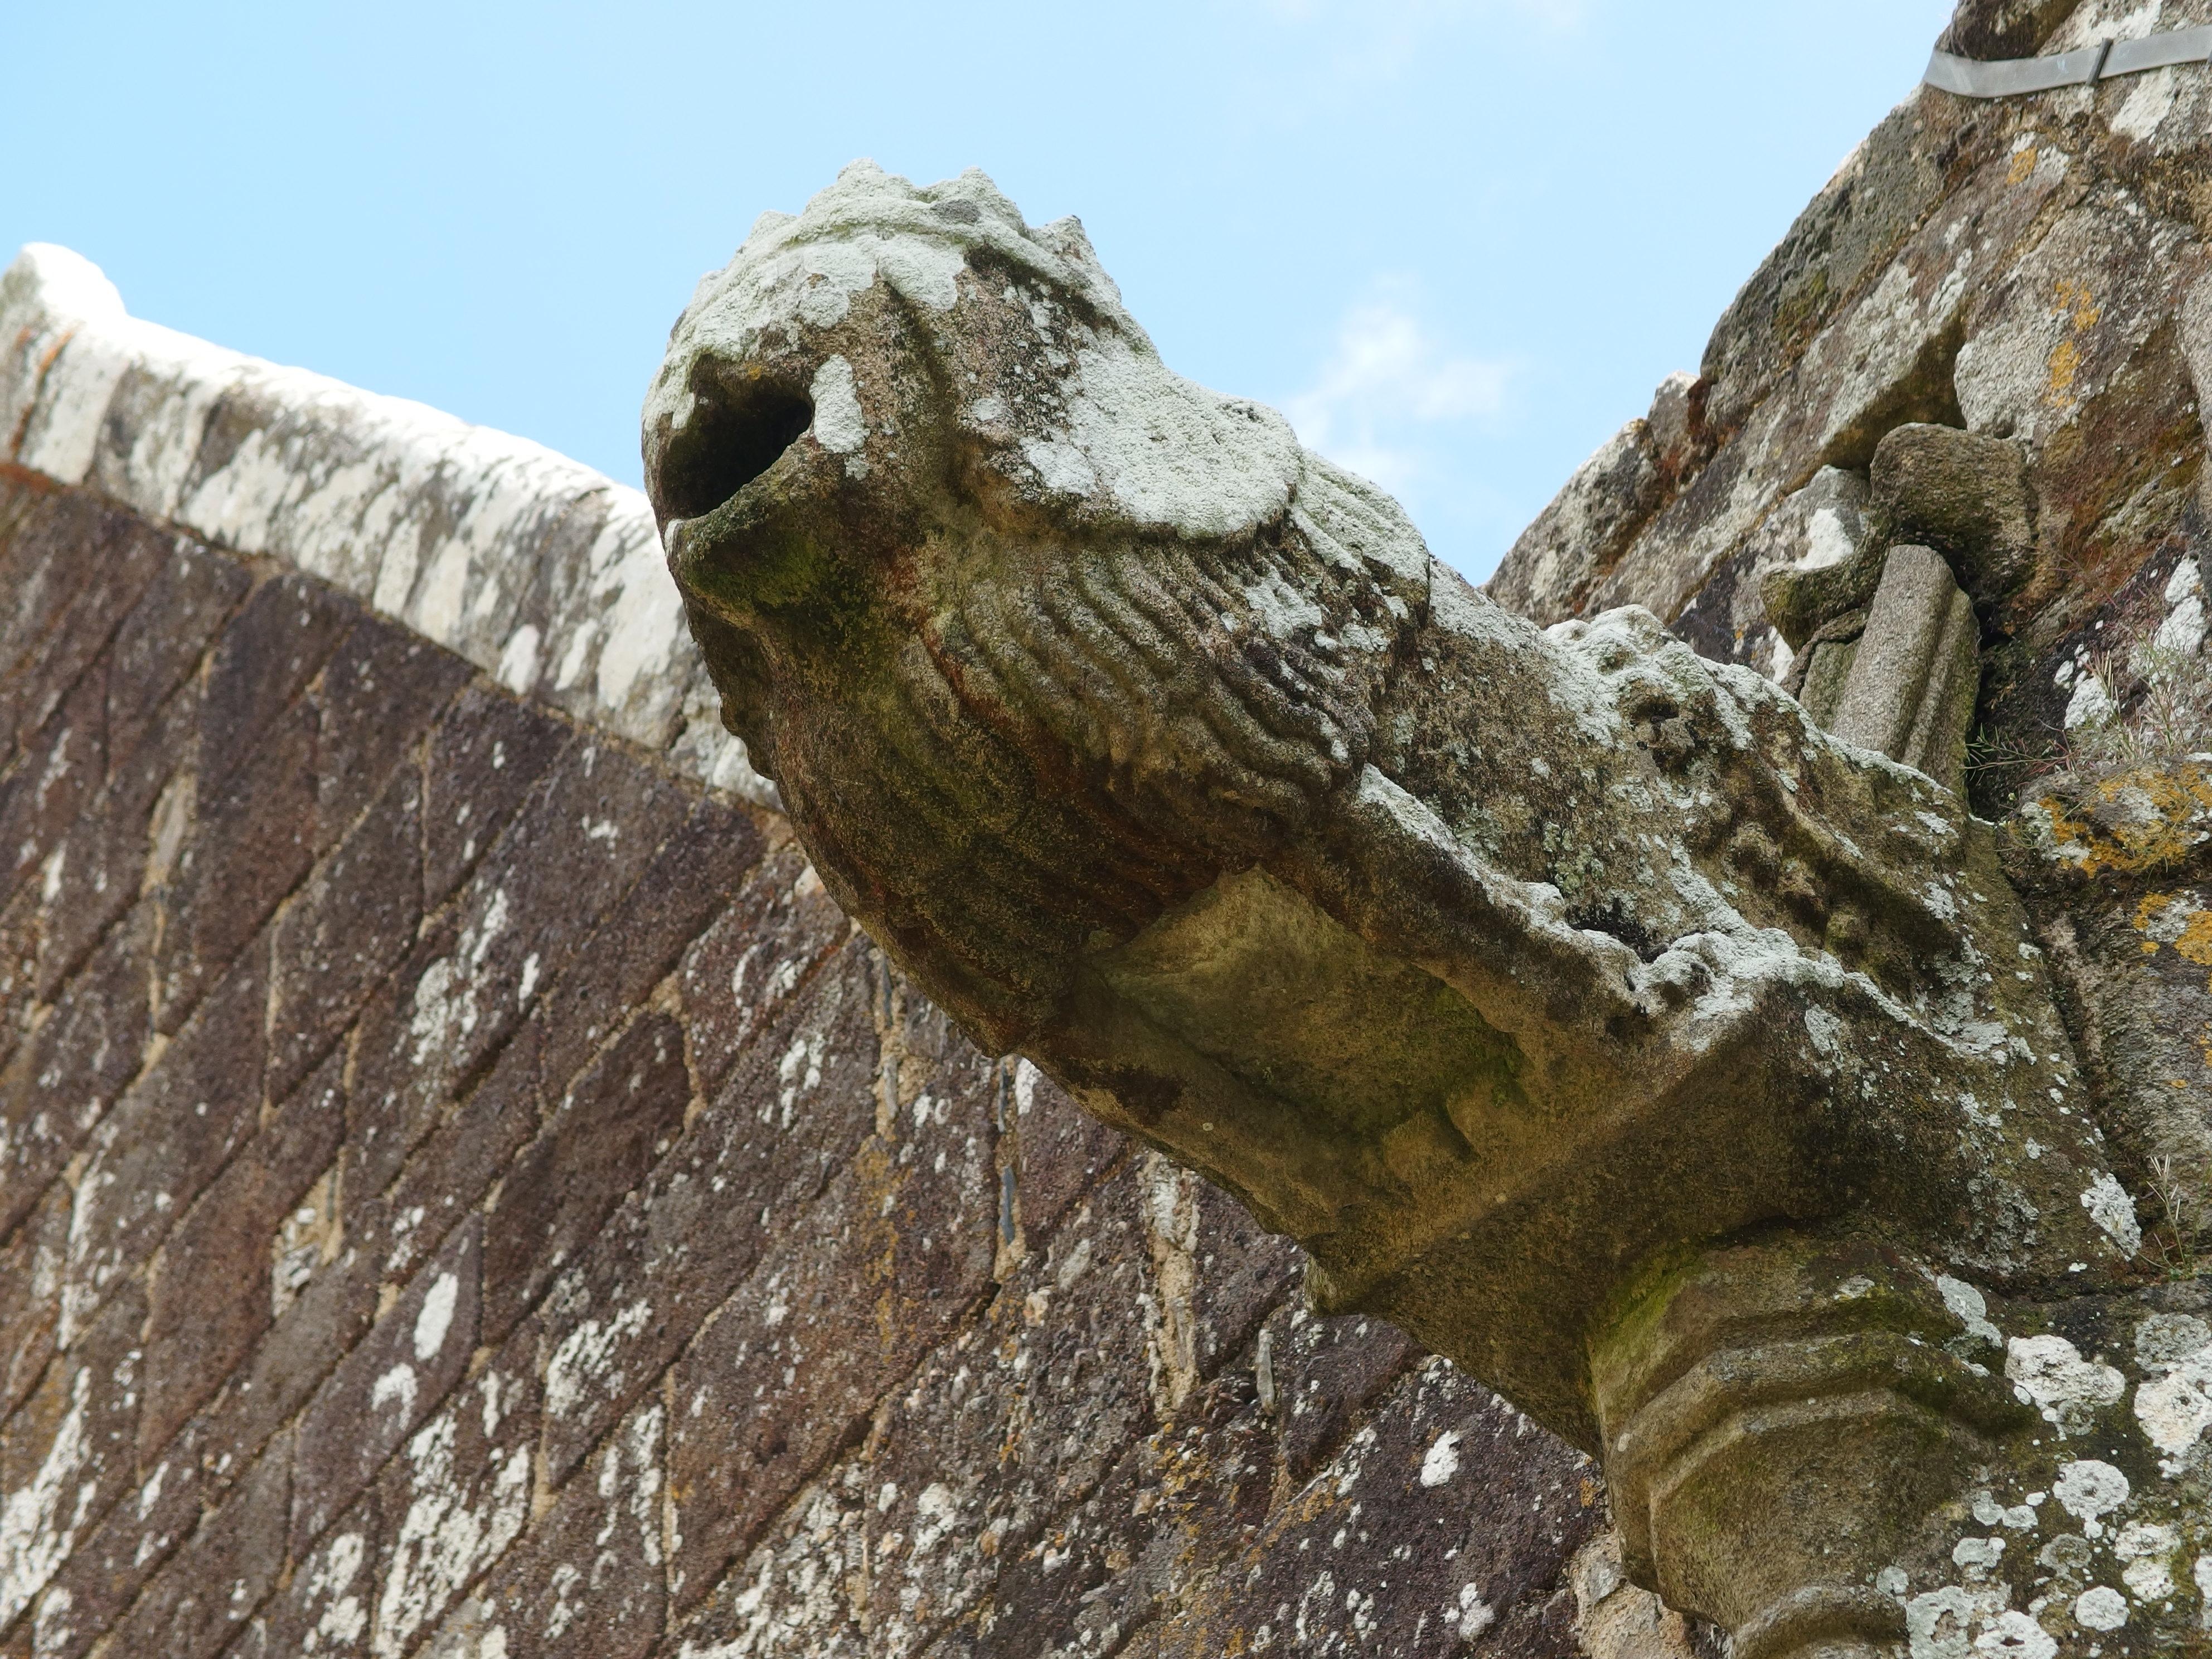 Gargoyle on the Chapelle Saint-Fiacre in Radenac, Brittany